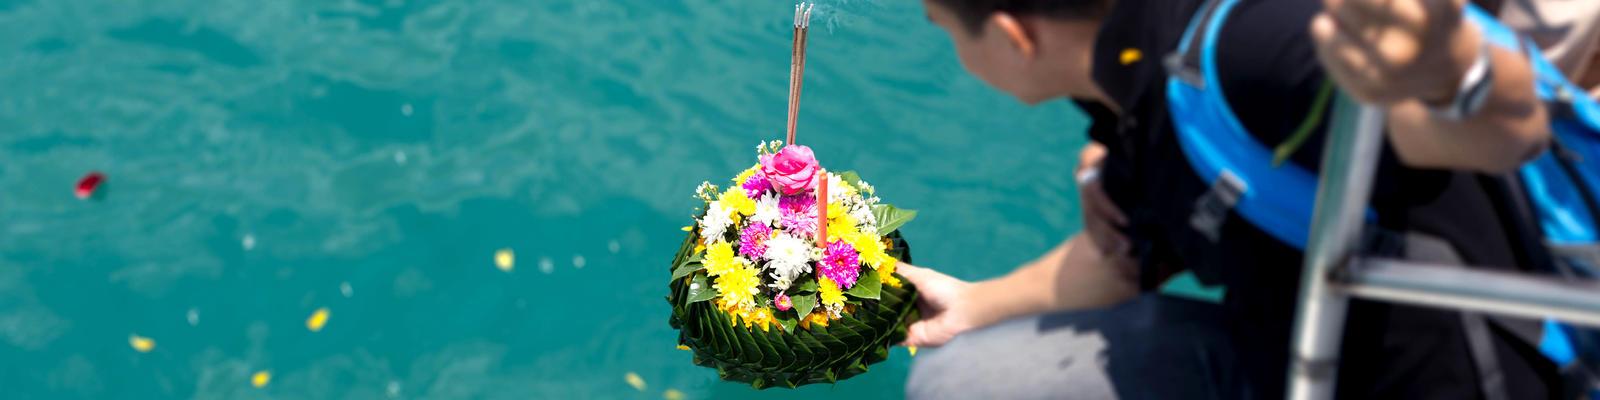 Ashes Ceremony in Thailand (Photo: Bignai/Shutterstock)